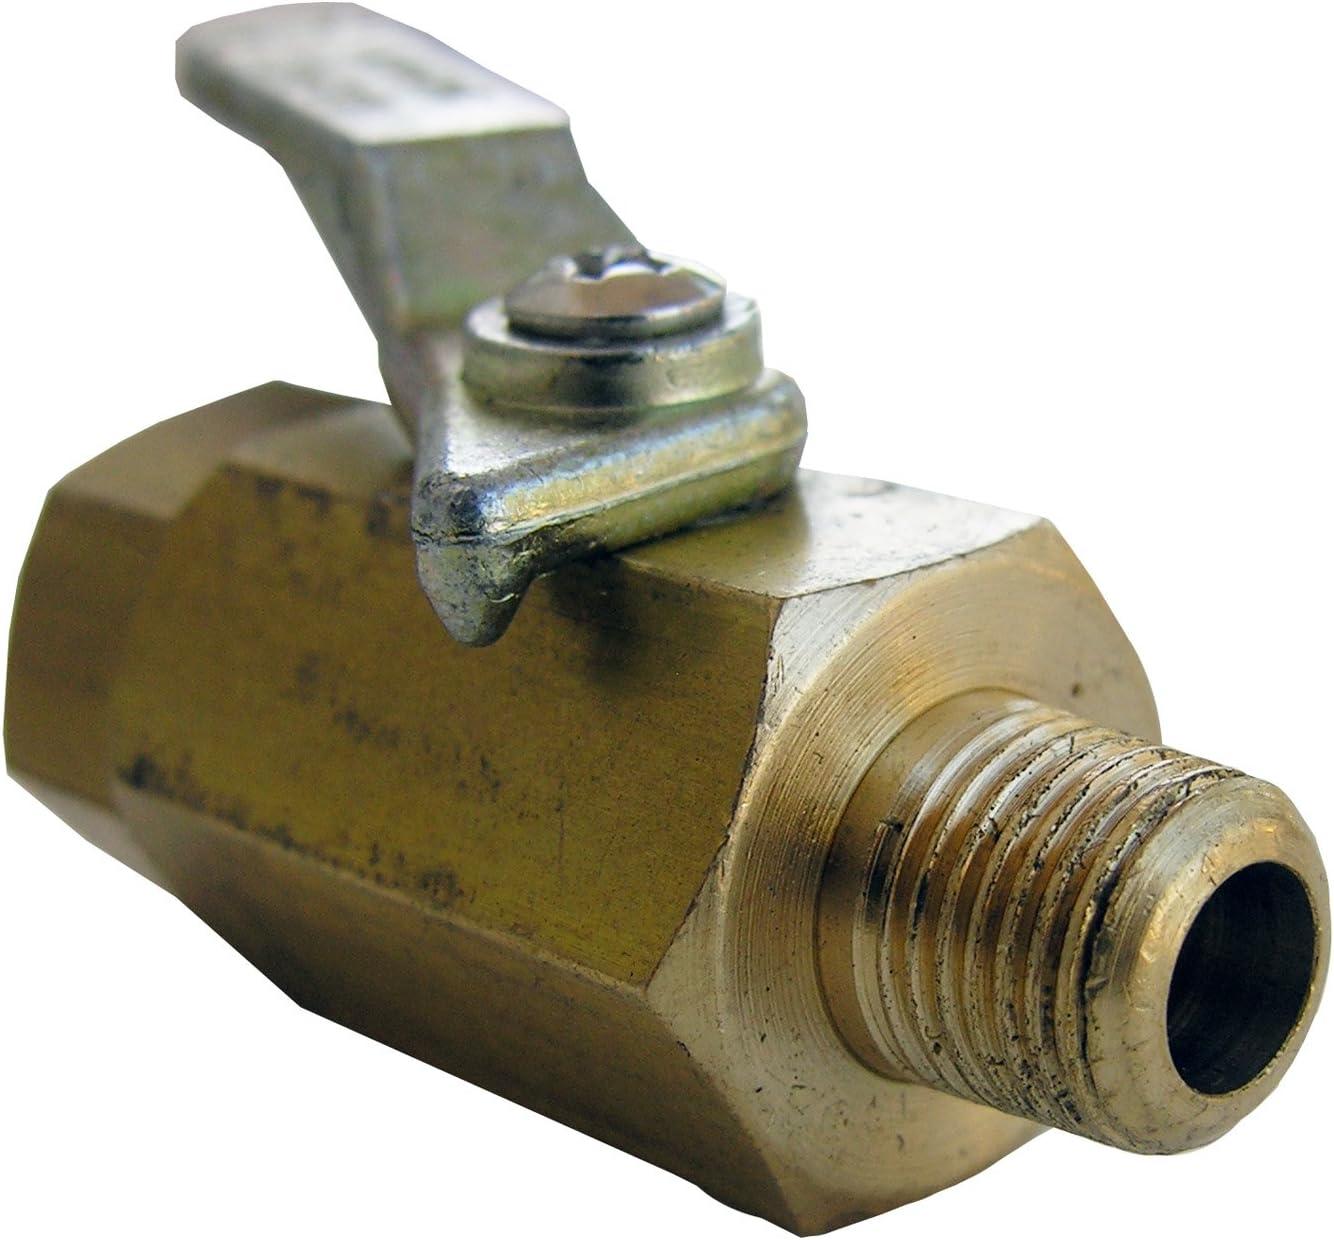 LASCO 17-0901 1/8-Inch Female Pipe Thread by 1/8-Inch Male Pipe Thread Brass Ball Valve